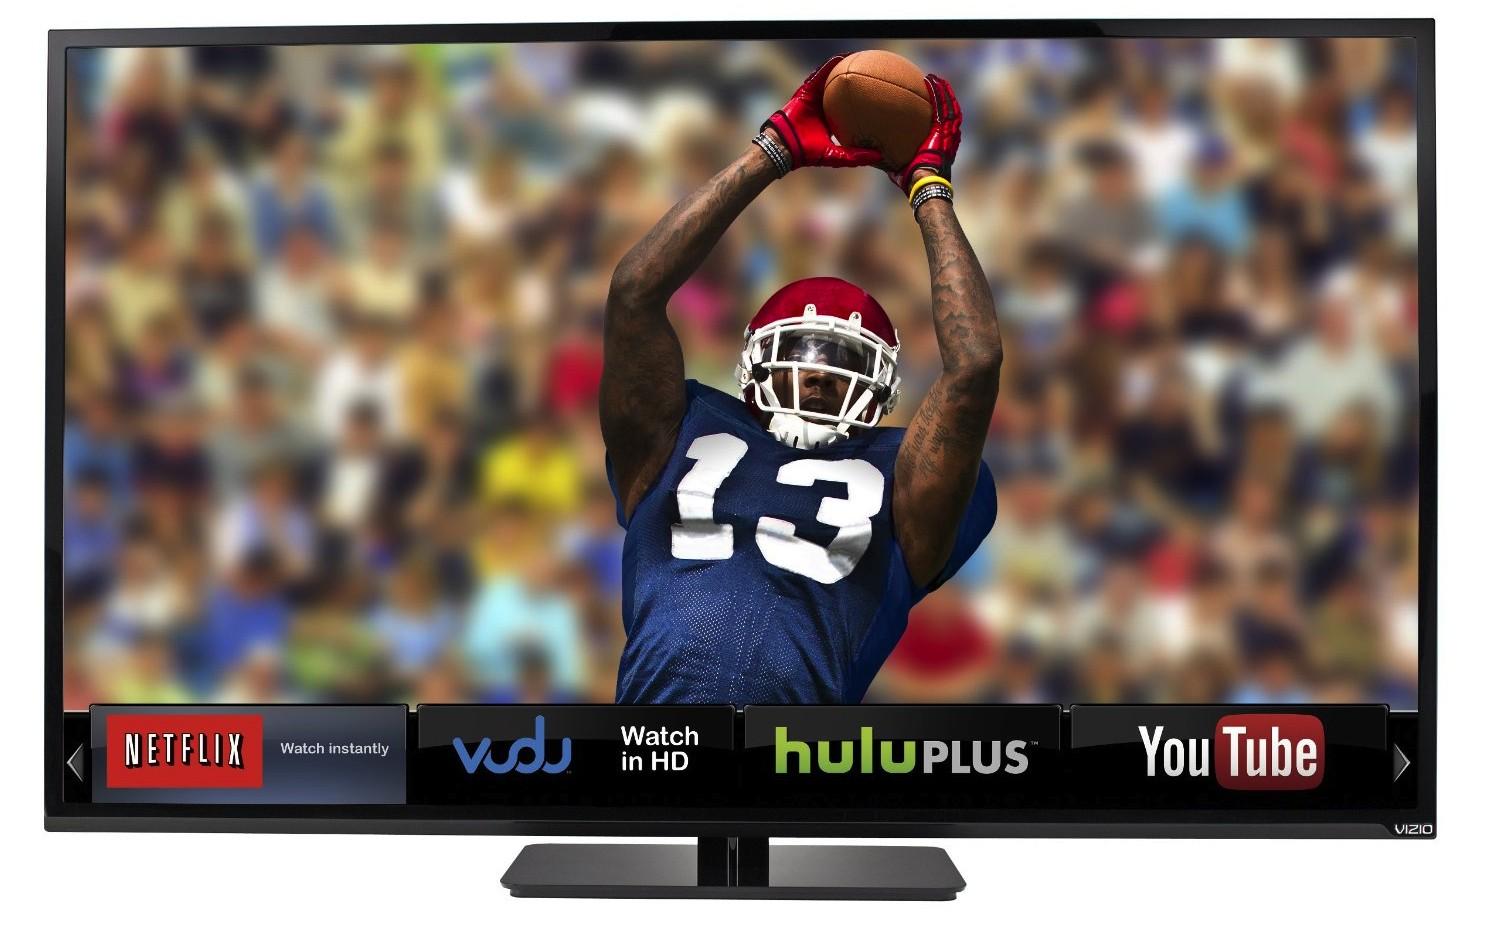 Entertaining Business: The Super Bowl means big TV sales